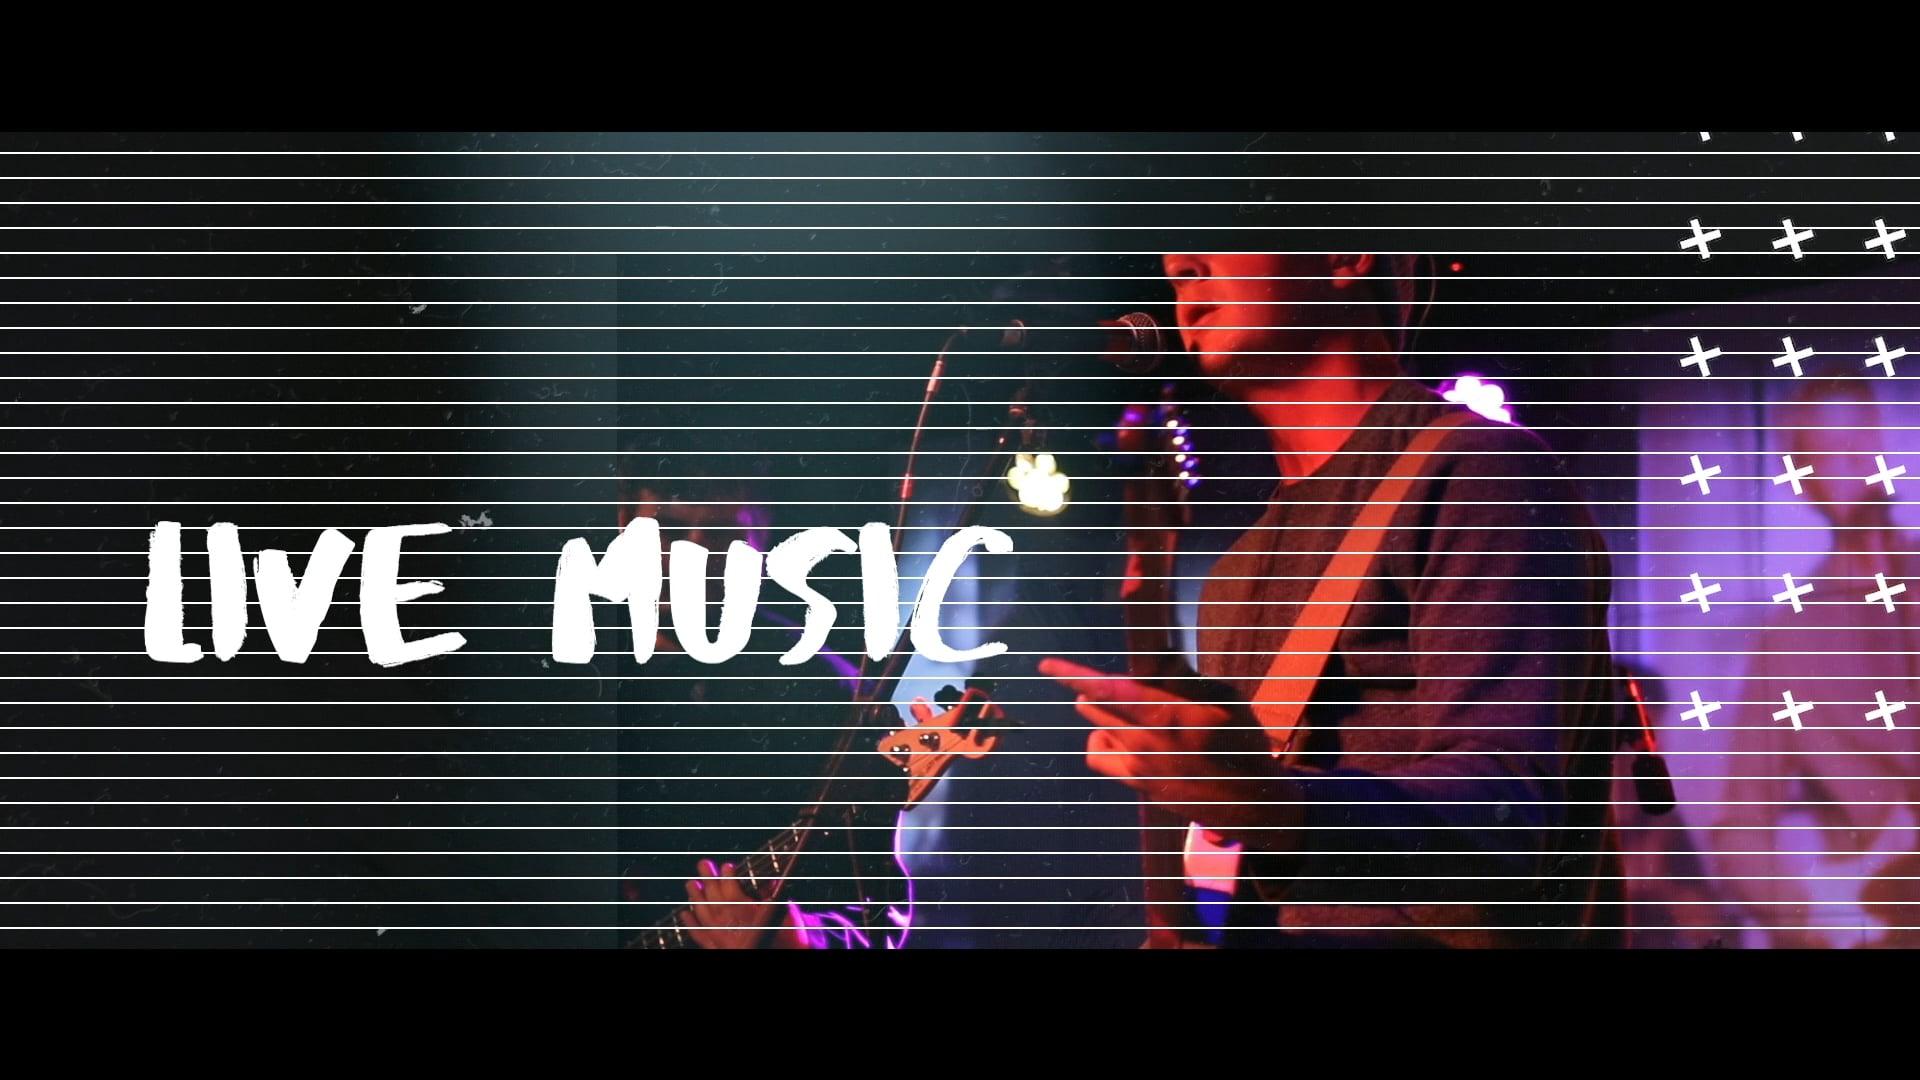 Live Music Video Recording